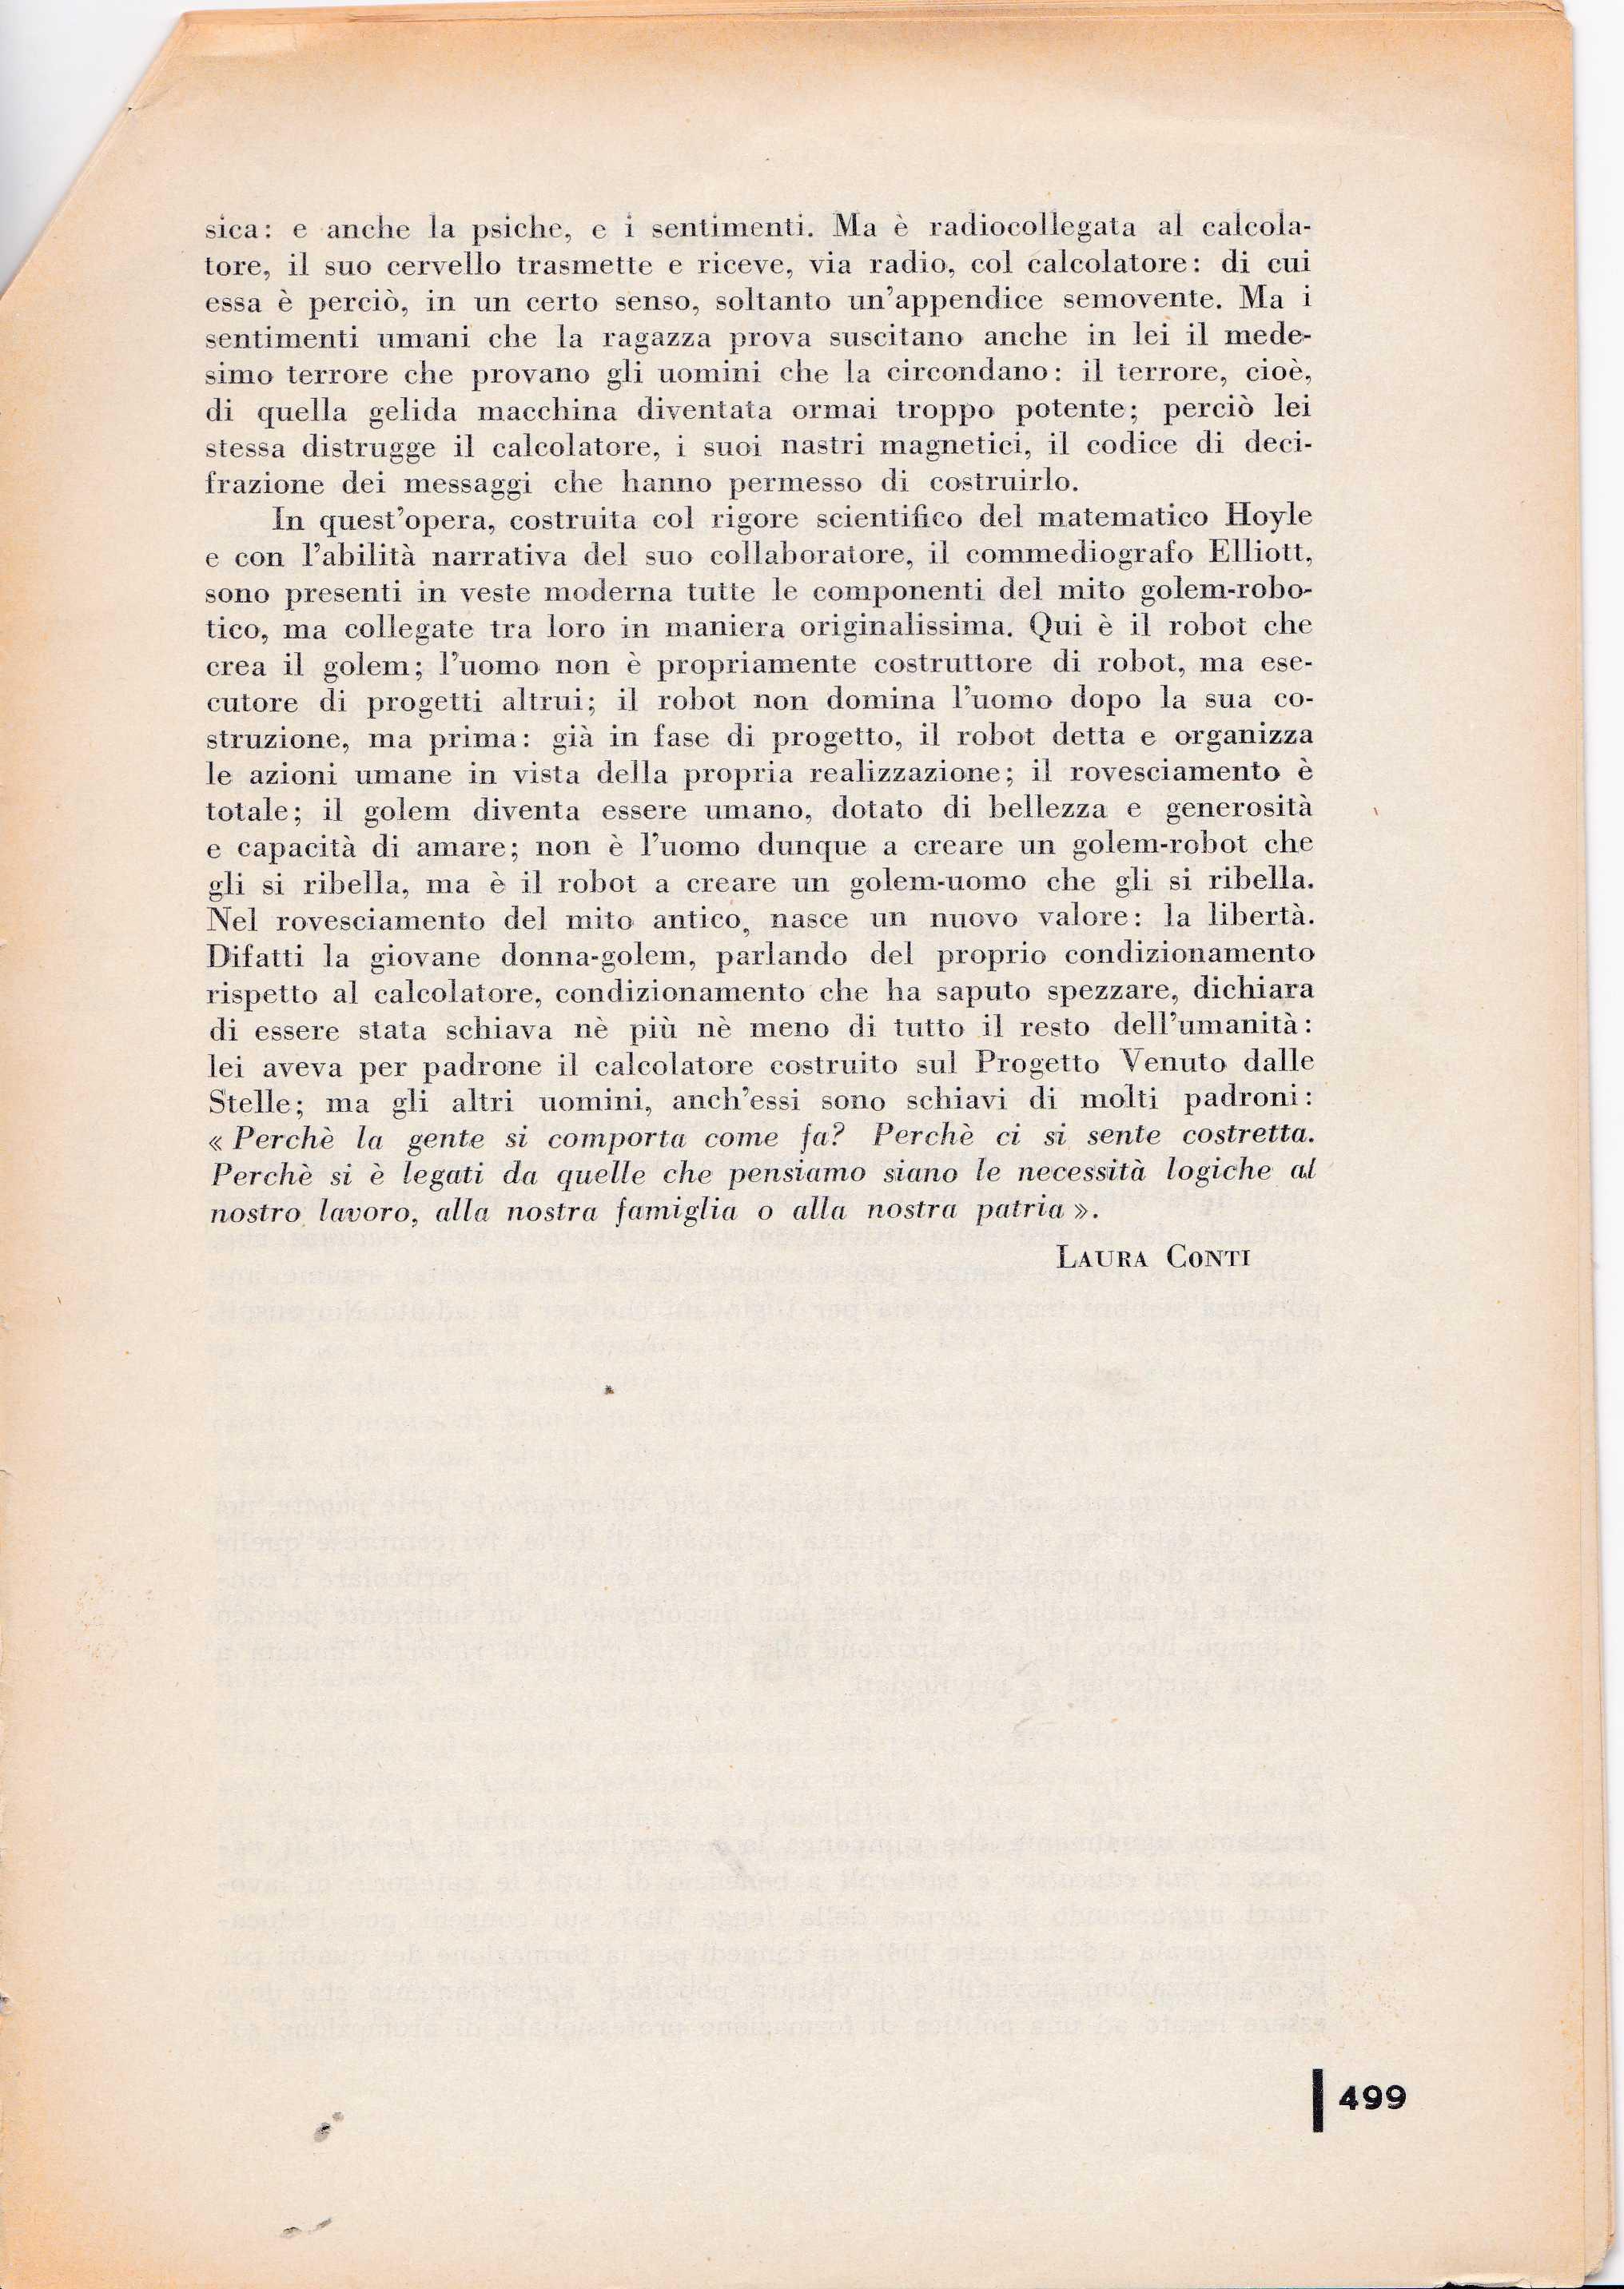 laura conti fantascienza 19673415